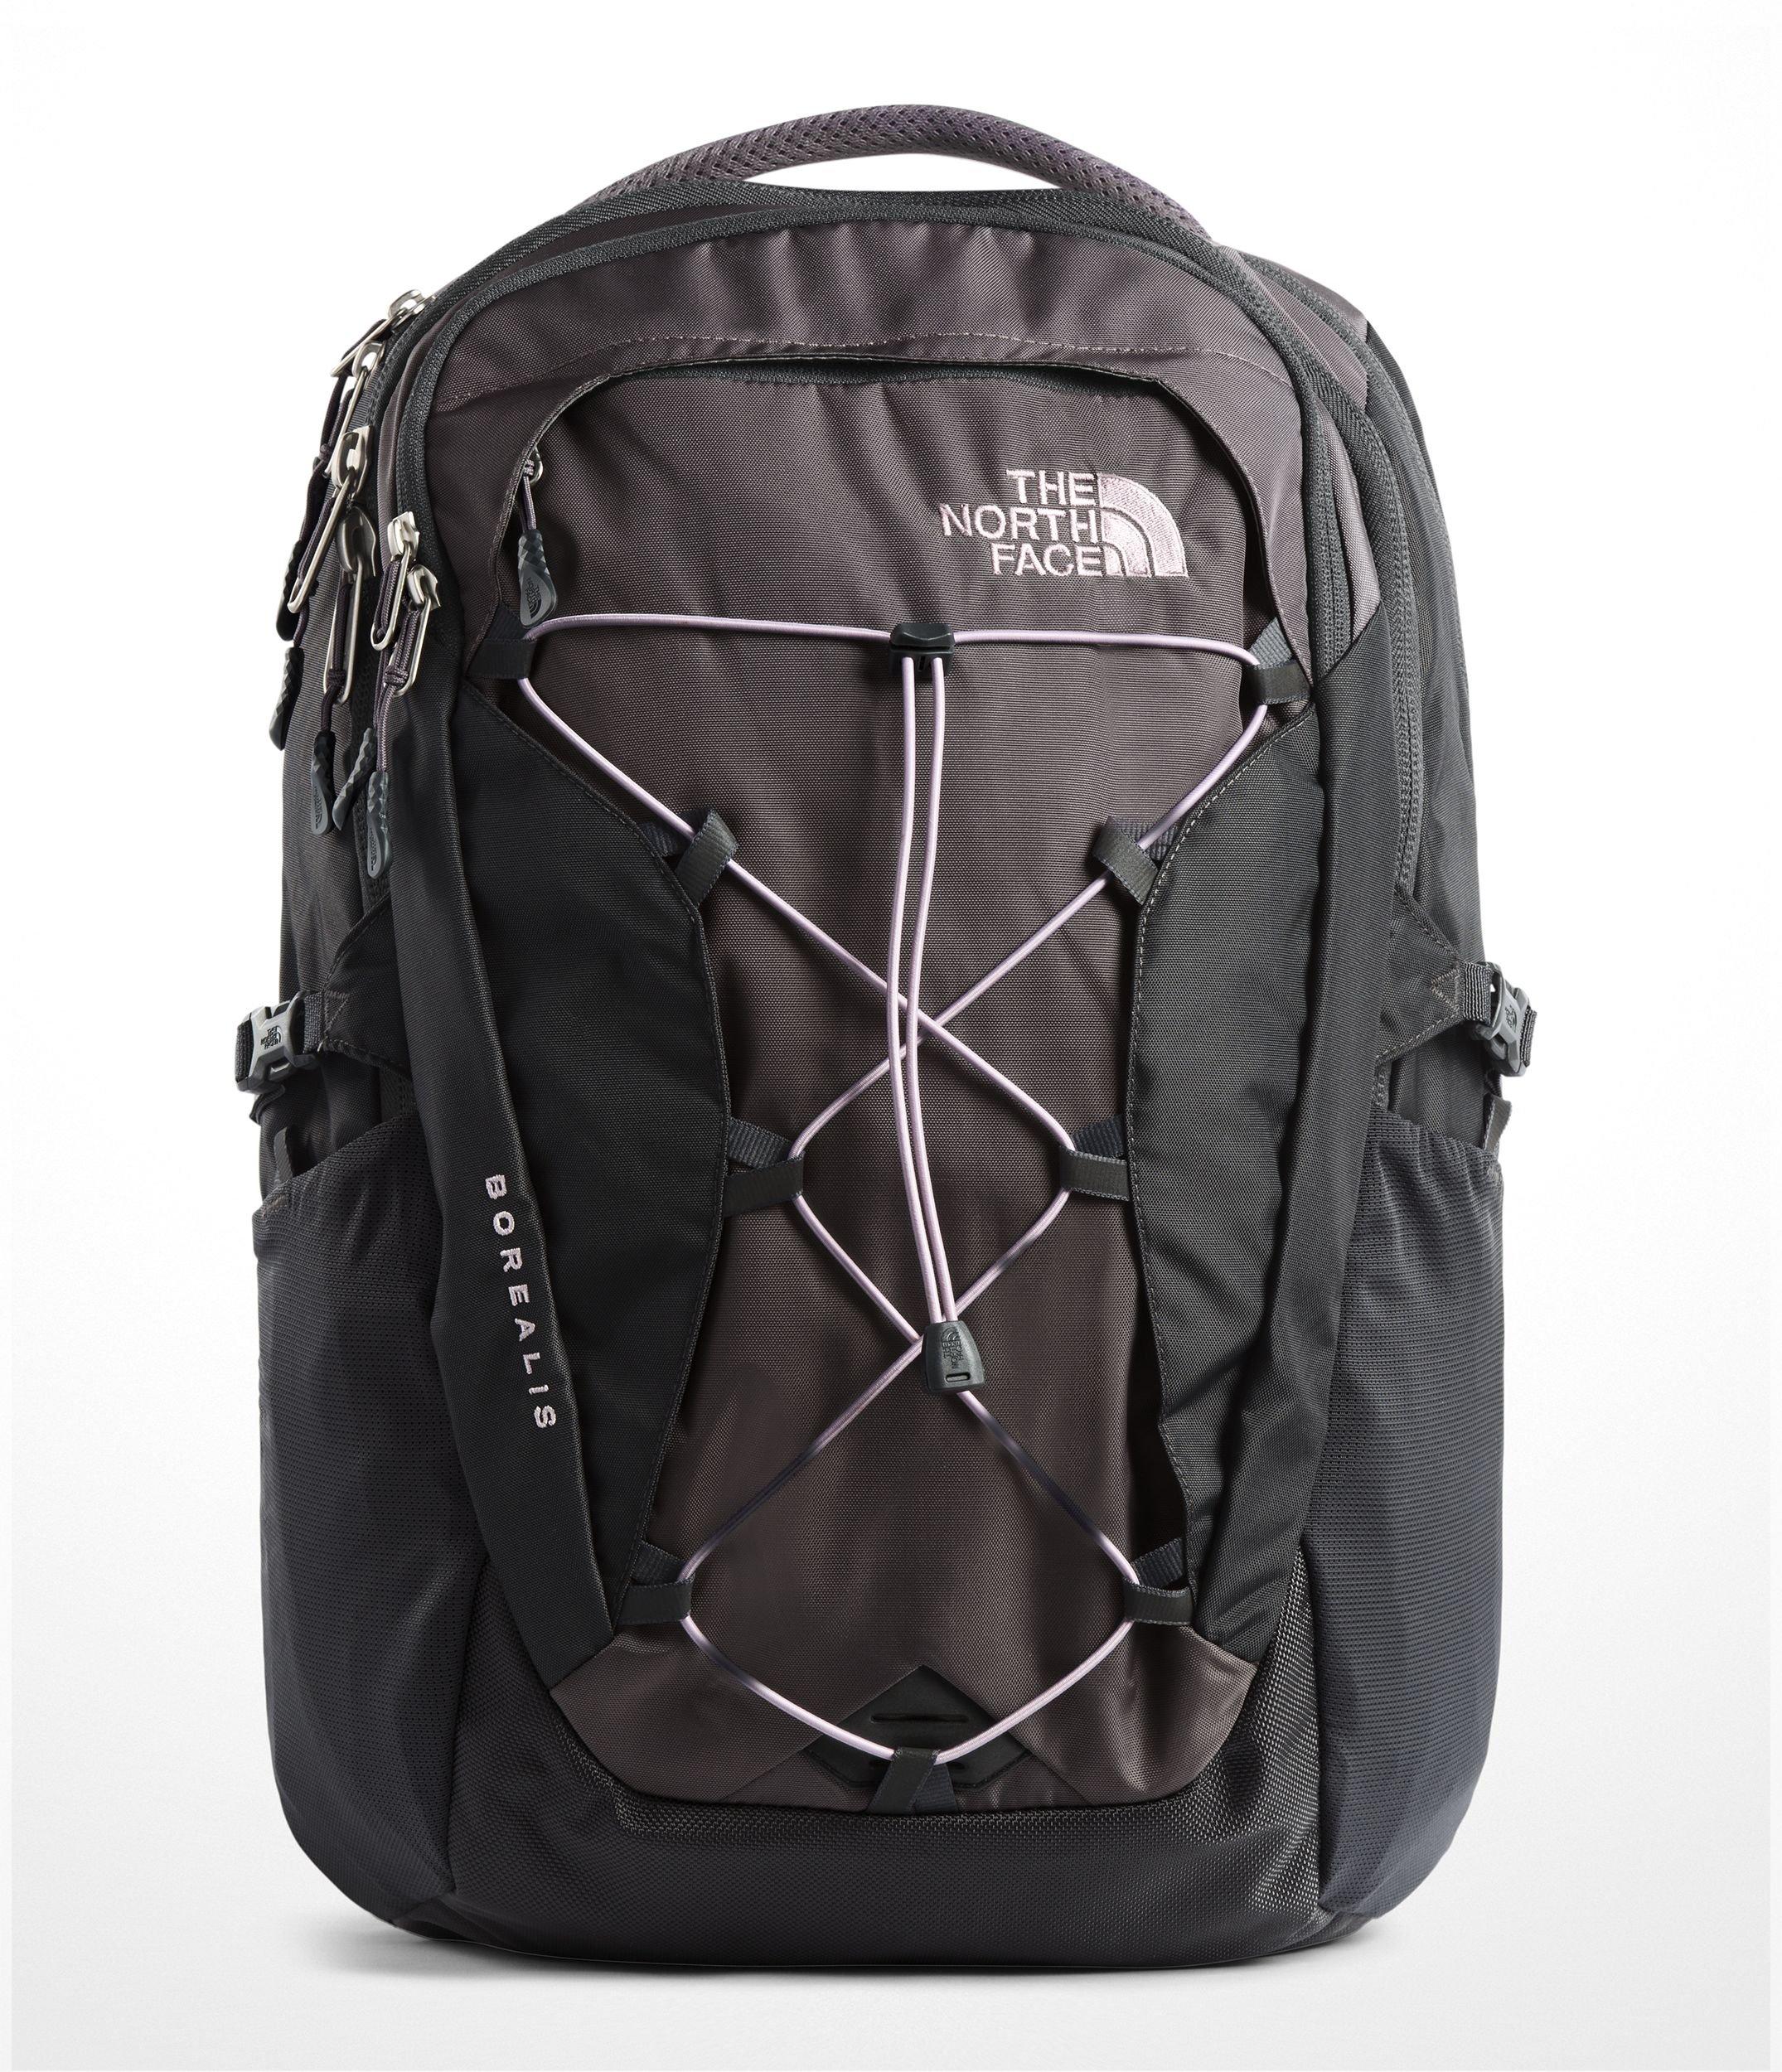 The North Face Women's Borealis Backpack - Rabbit Grey & Asphalt Grey - OS